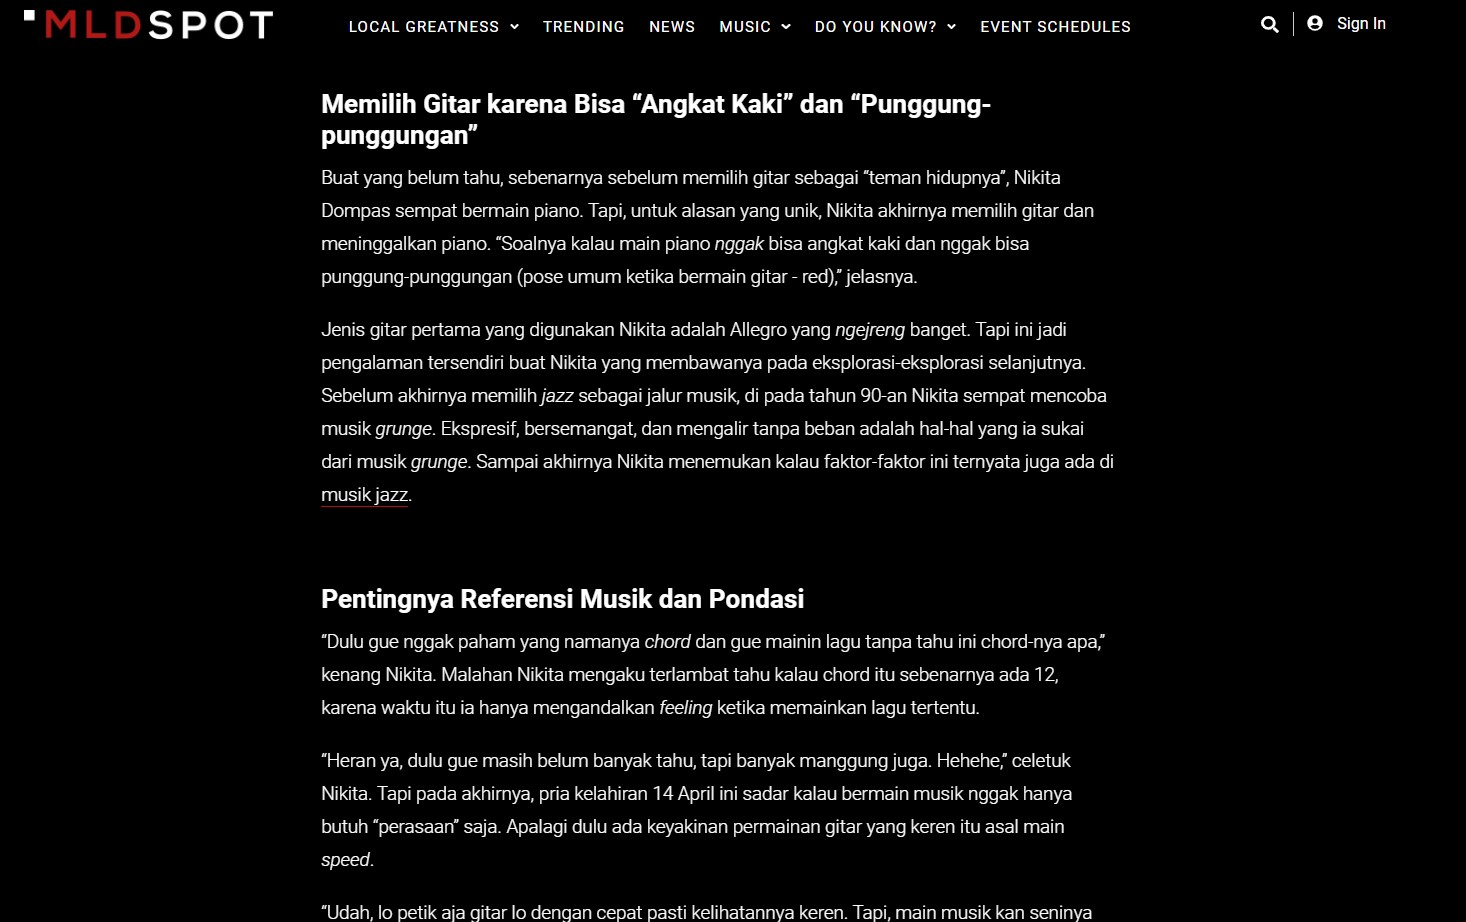 nikita-dompas-content marketing-2